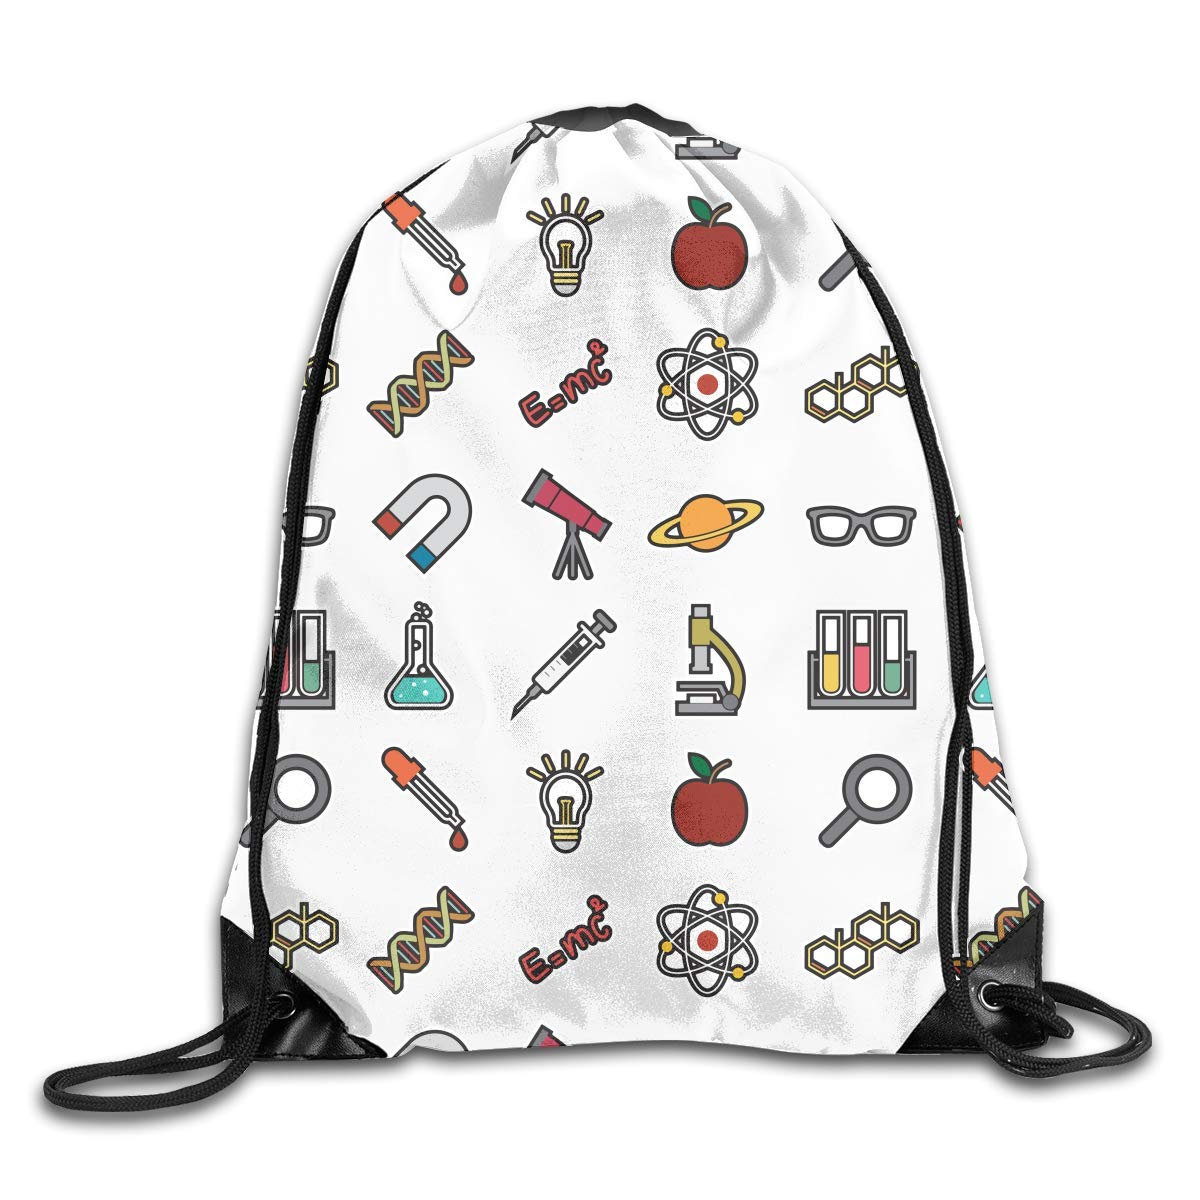 sd4r5y3hg Periodically Science Unisex Drawstring Backpack Shoulder Bags Lightweight Travel Rucksack 1FGI0LI9L2L7W8C5ATD2